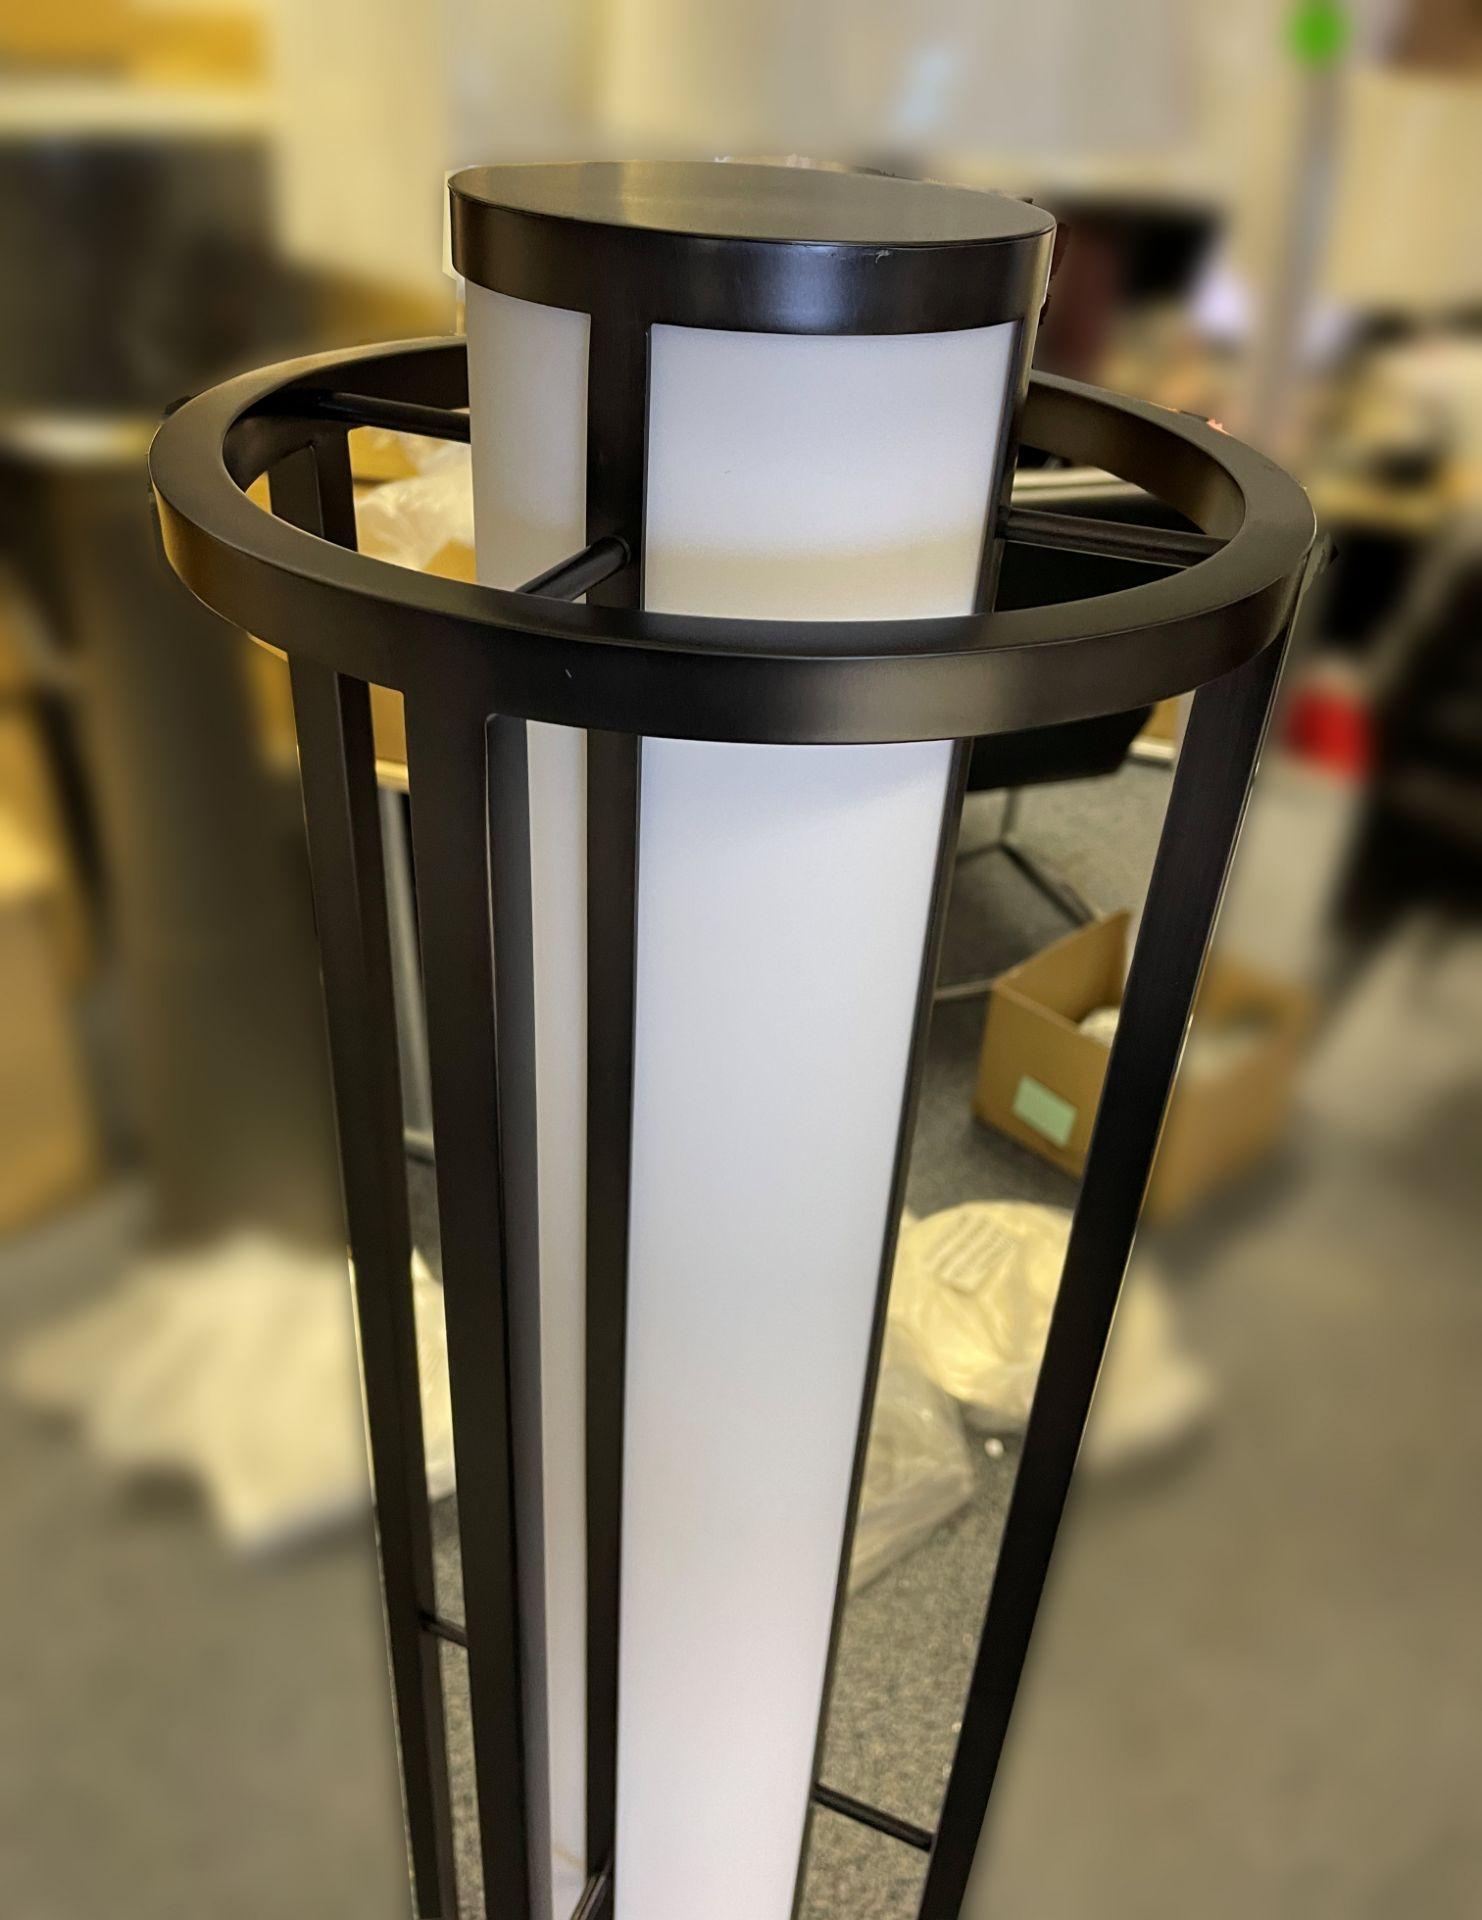 1 x Chelsom Art Deco Style Floor Lamp in Black/Bronze Height 161cm x 30cm Diameter - Ref: CHL197 - - Image 2 of 10